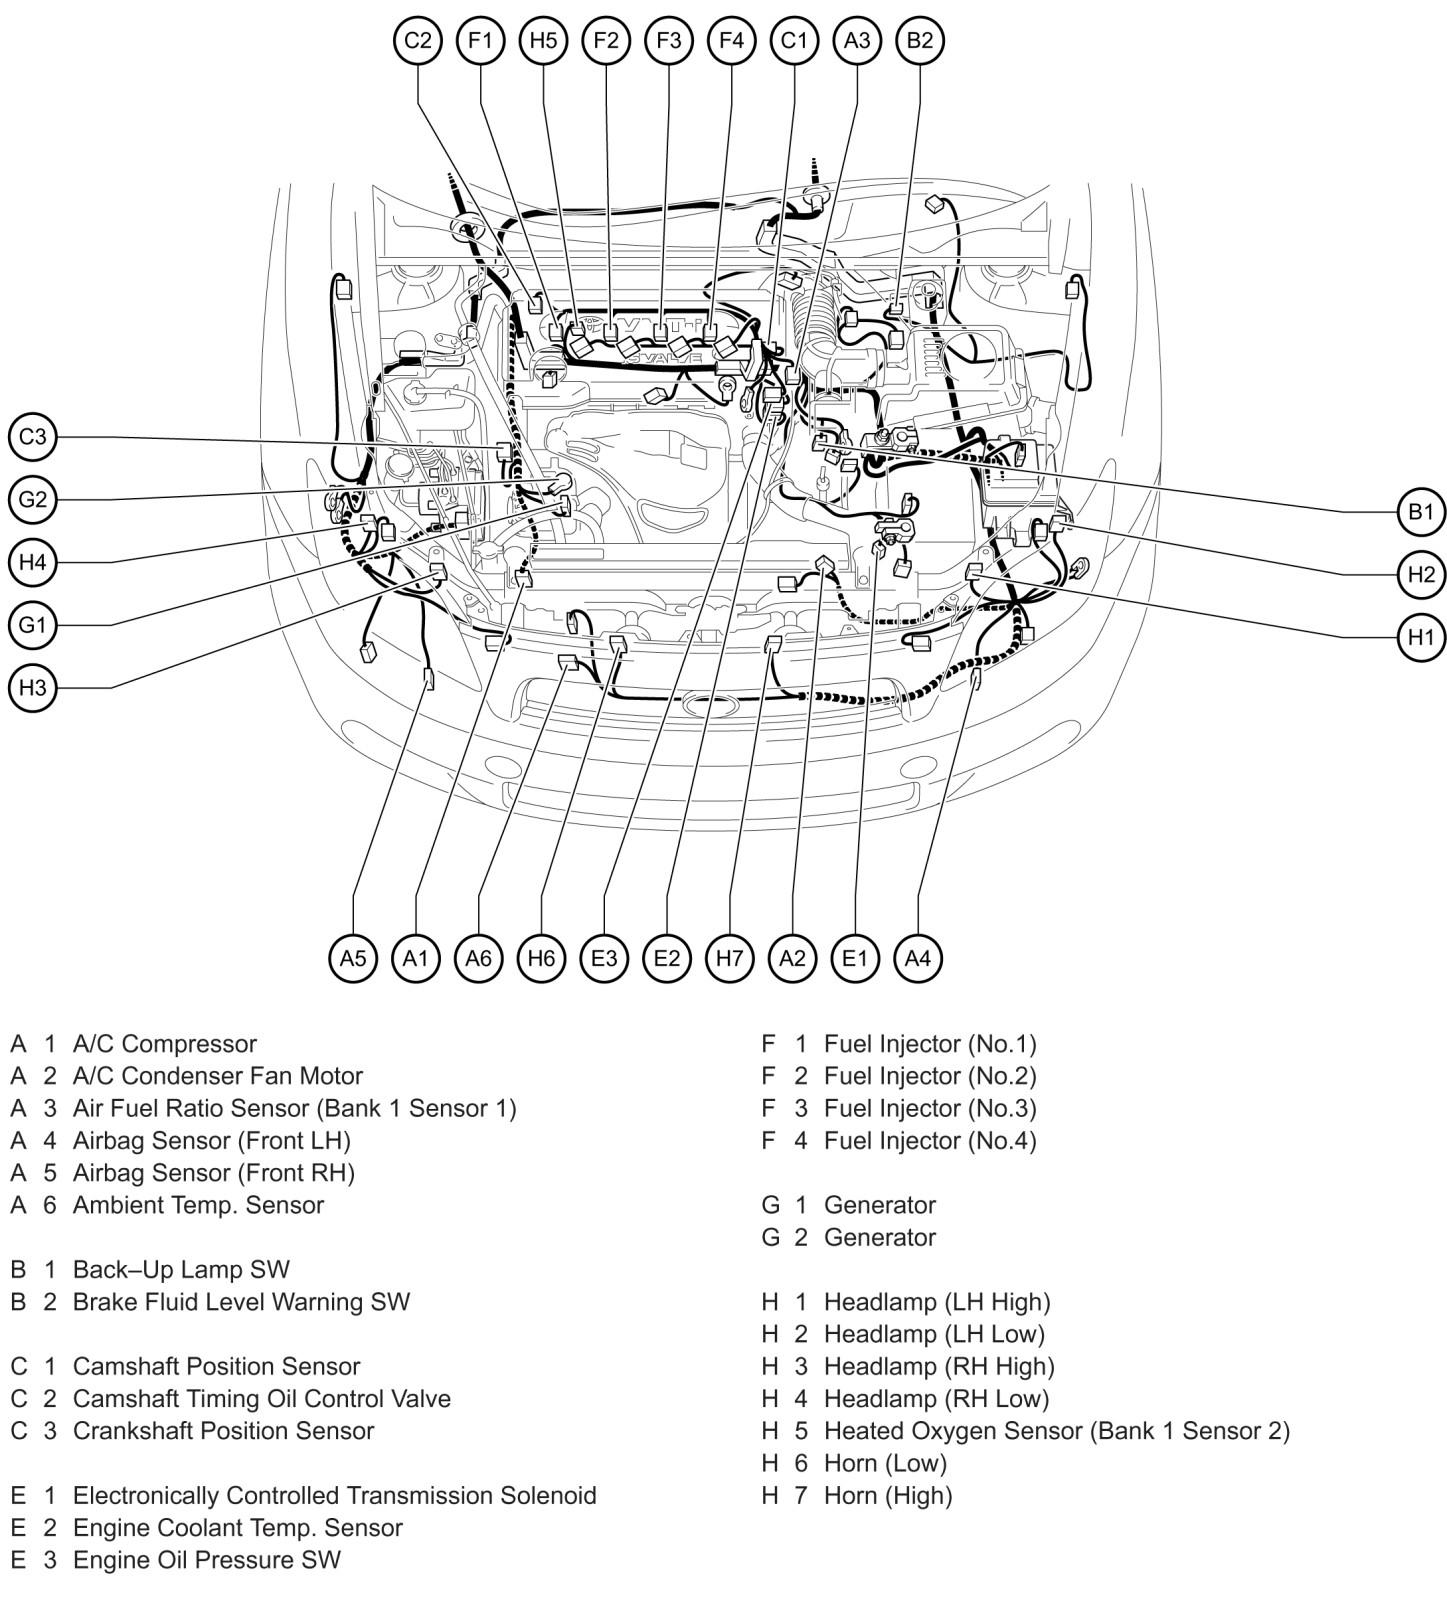 2010 Scion Xd Engine Diagram List Of Schematic Circuit 2007 Subaru 2 5